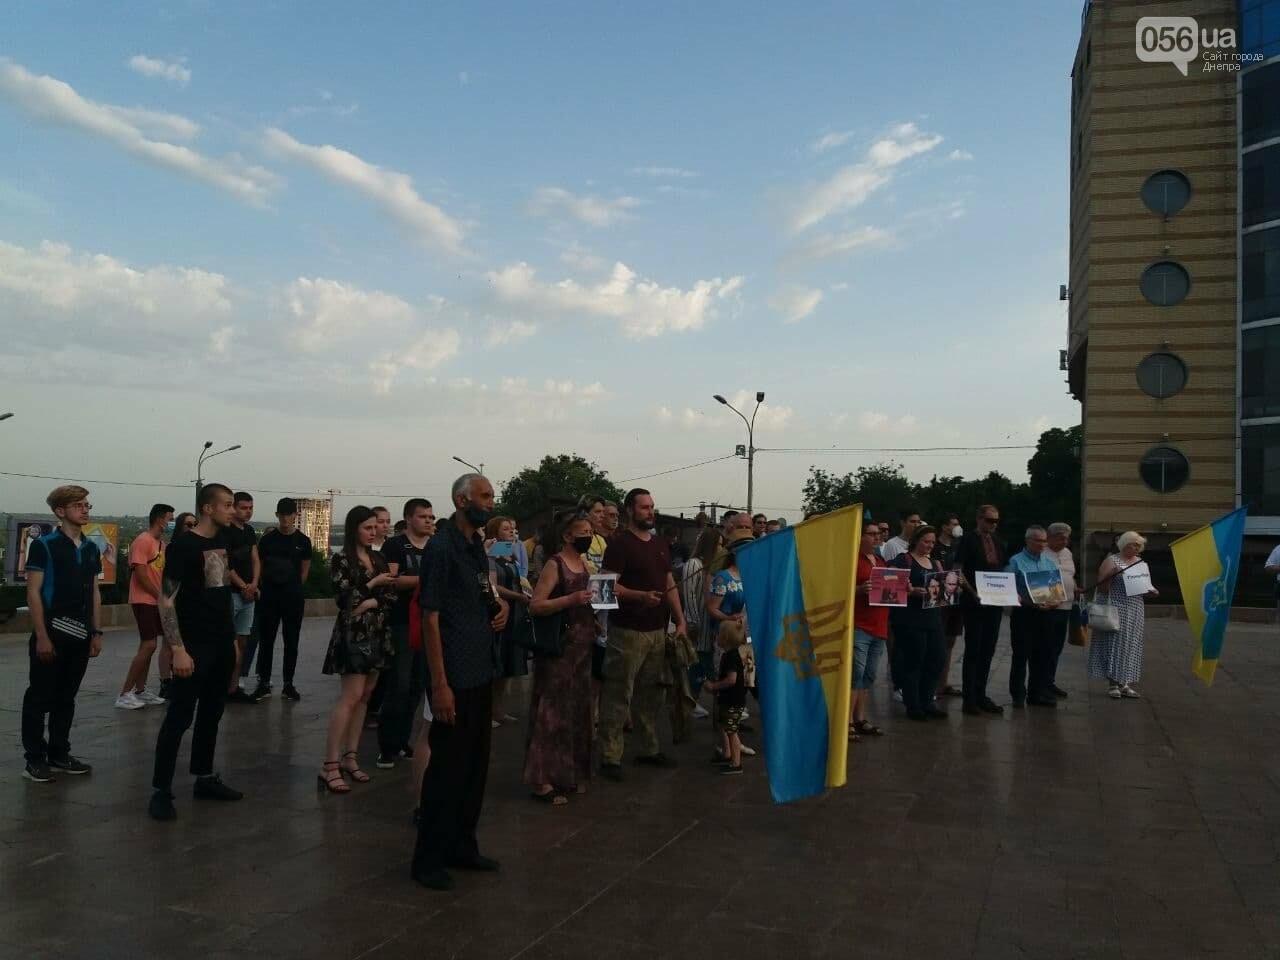 В Днепре активисты заявили, что победят Путина, - ФОТО, ВИДЕО, фото-6